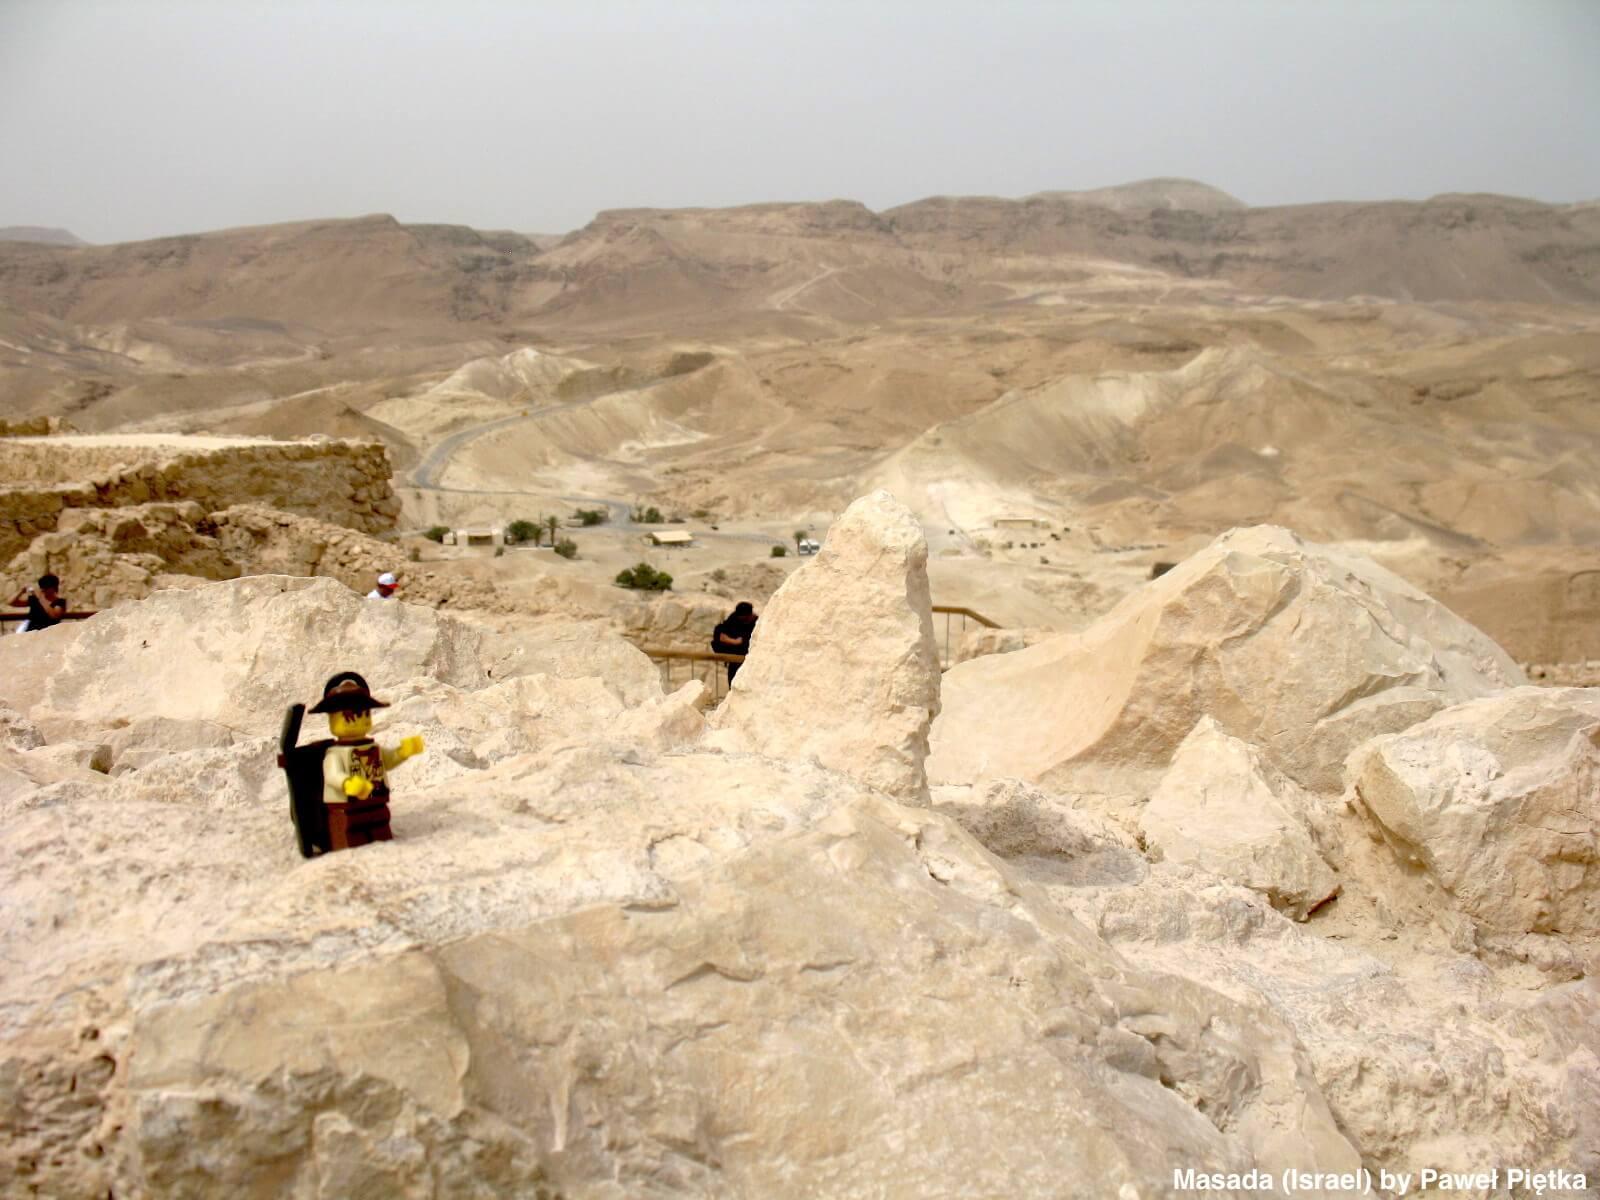 Masada (Israel) - Judaean Desert